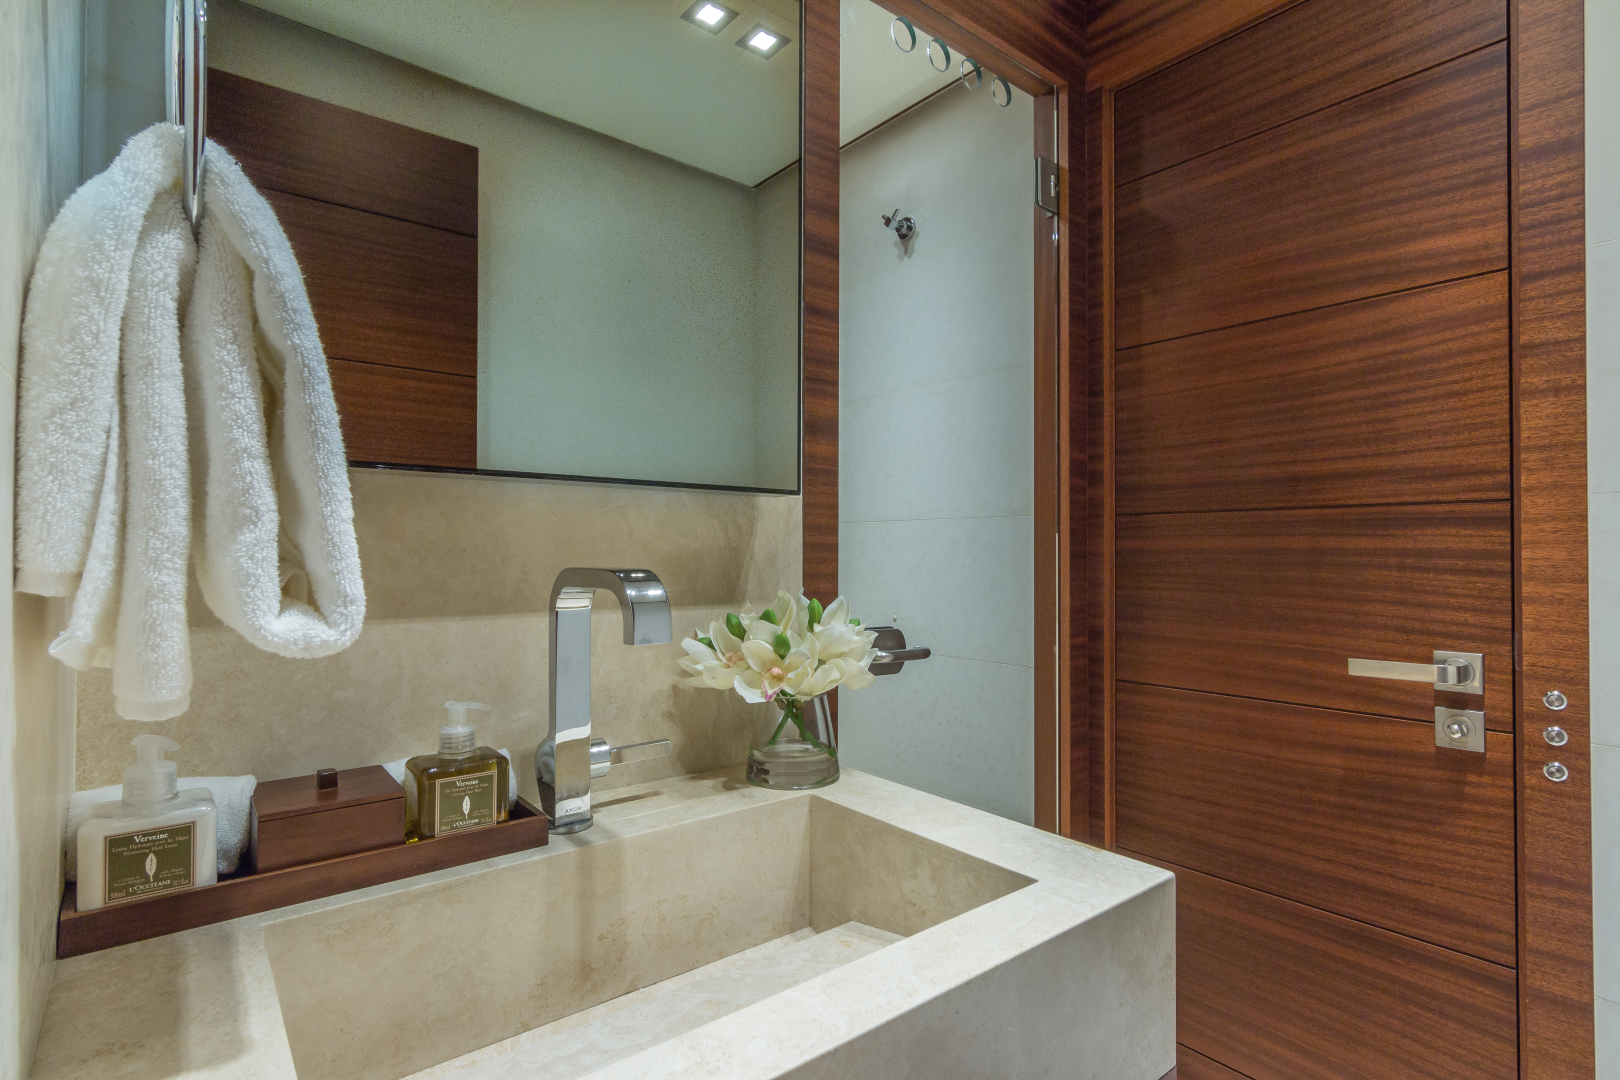 Vicem-Raised Pilot House 2013-MONI FORT LAUDERDALE-Florida-United States-GUEST BATHROOM-1394875 | Thumbnail